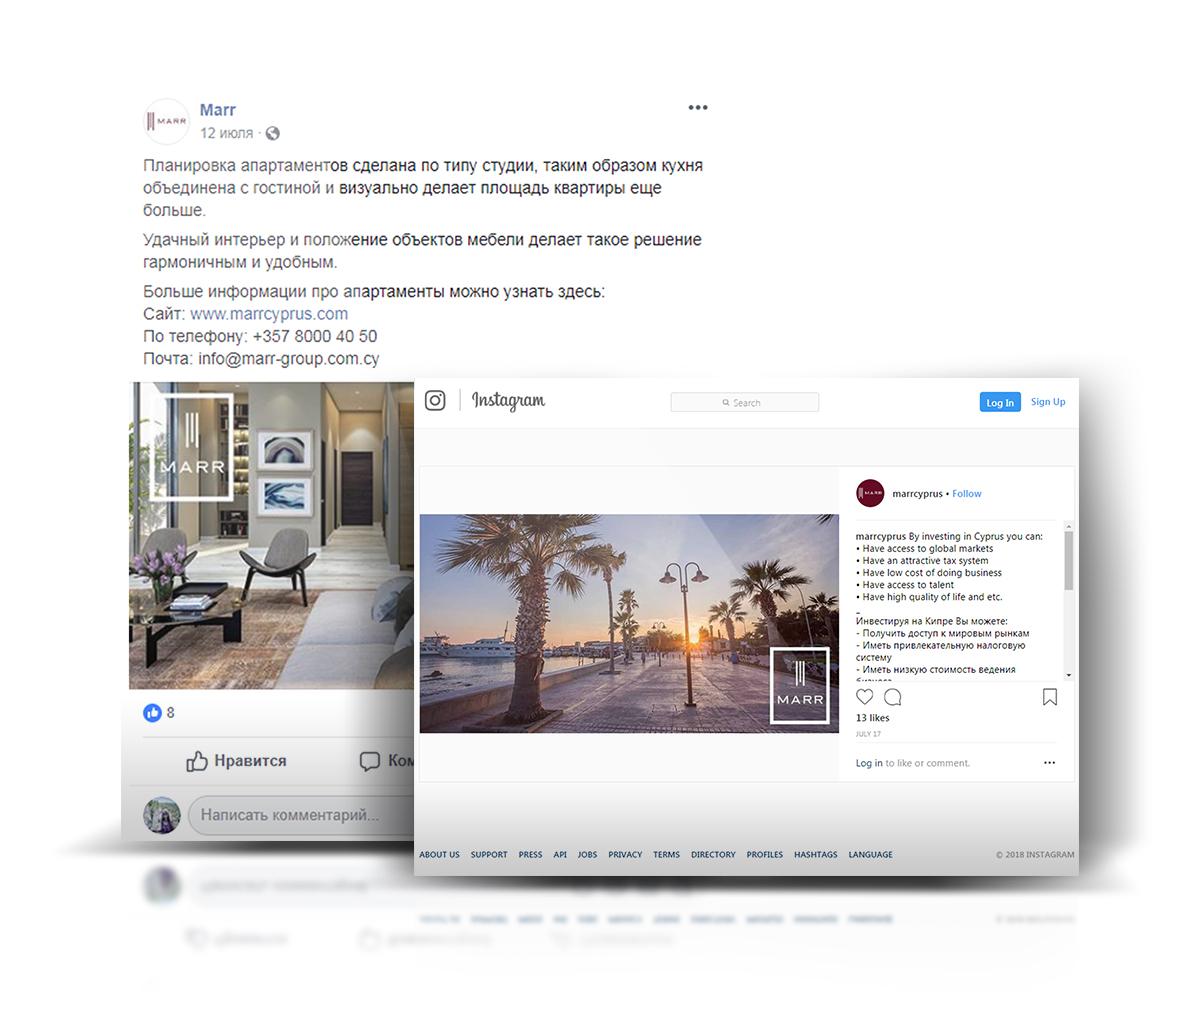 Branding Box: Social Media Management Services